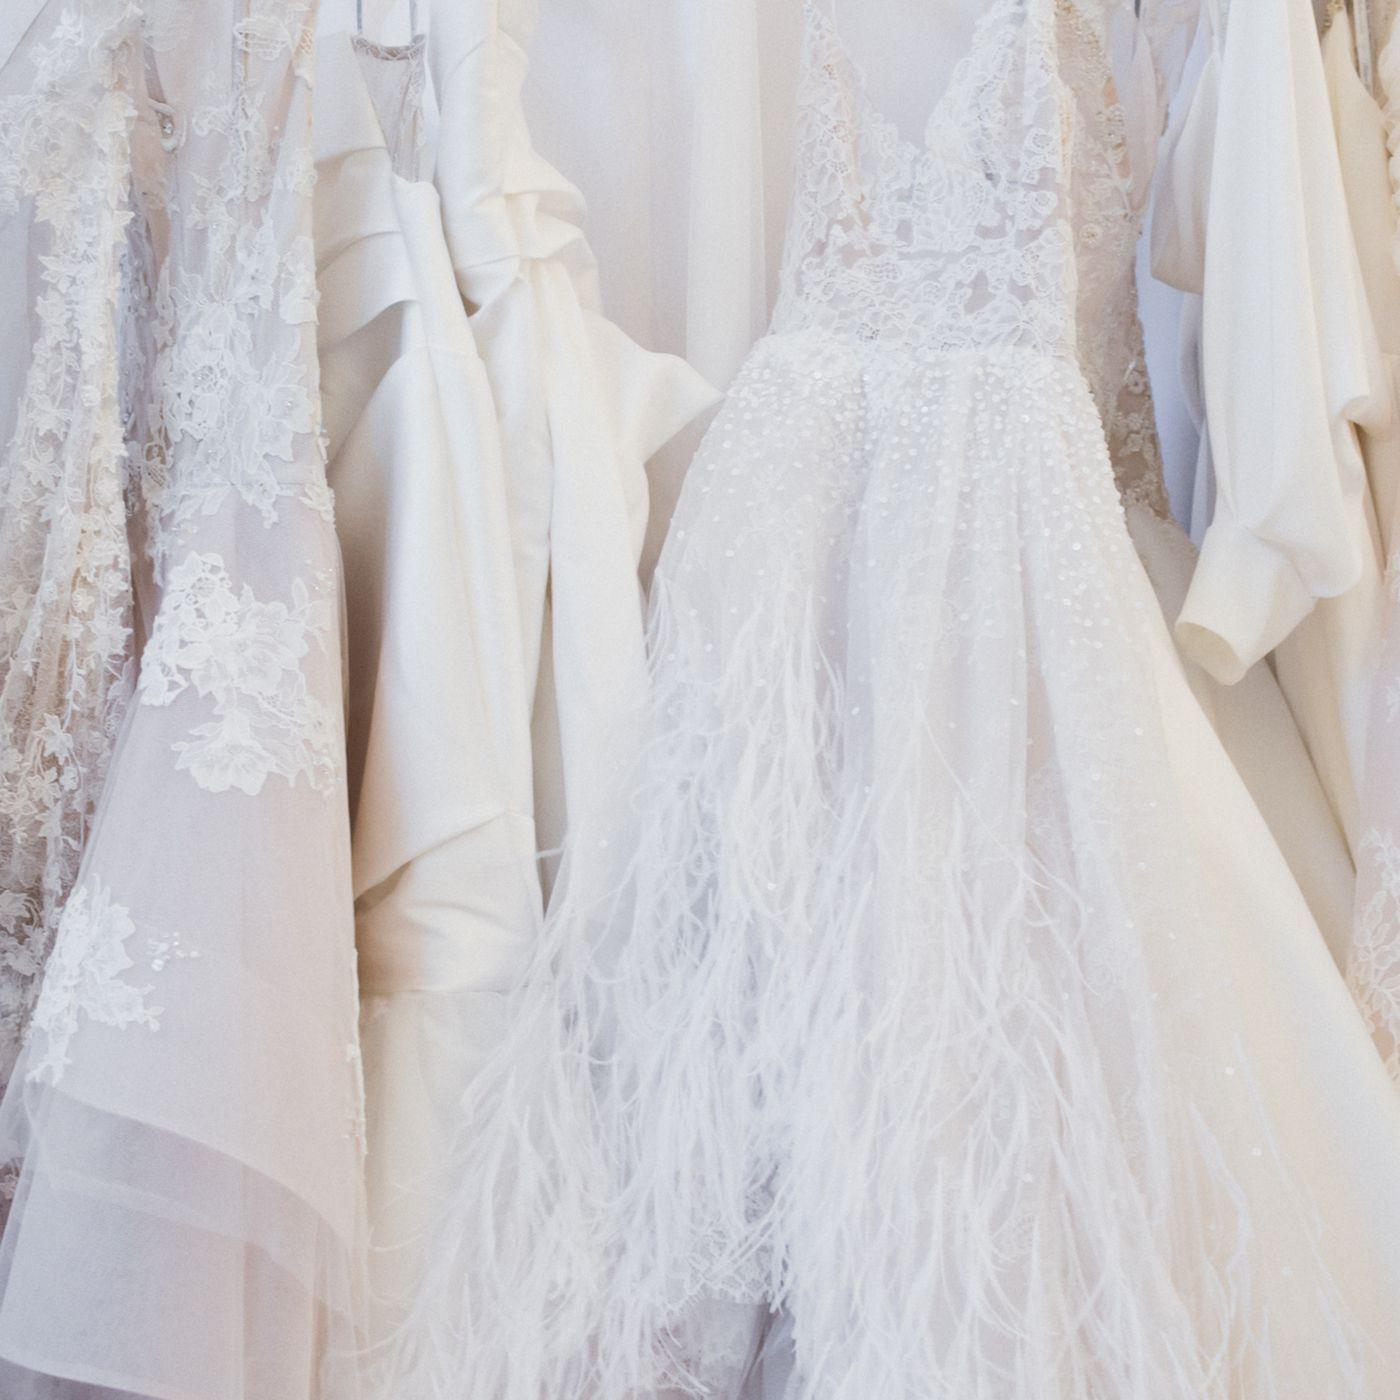 Second Hand Wedding Dresses Kansas City In 2020 Rental Wedding Dresses City Wedding Dress Second Hand Wedding Dresses